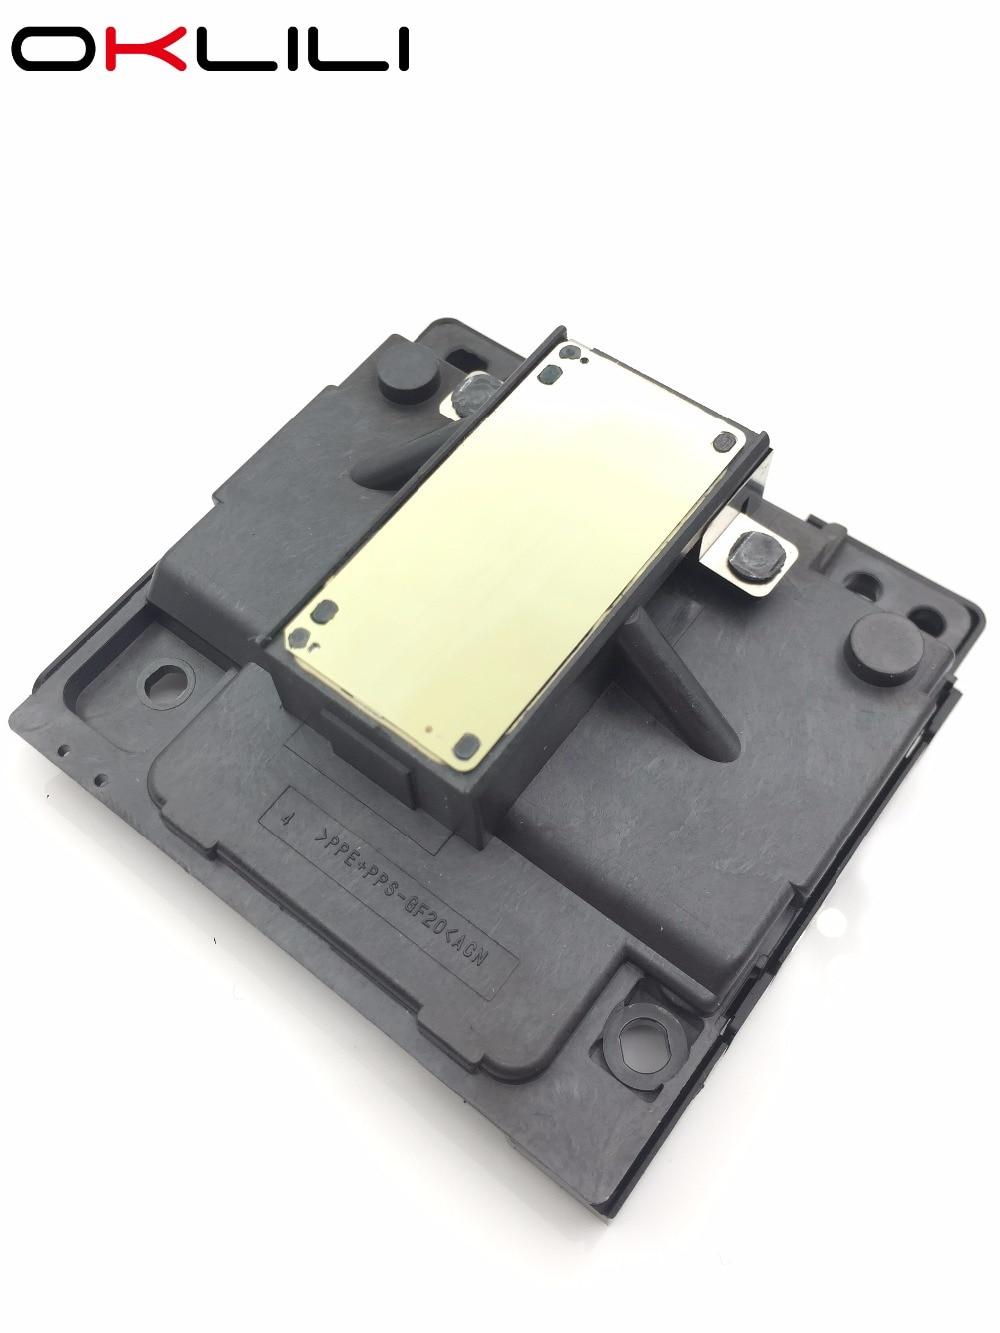 PA03484 E905 Chute Unit Input Paper Tray For Fujitsu Fi 4120C Fi 4220C Fi 5120C Fi